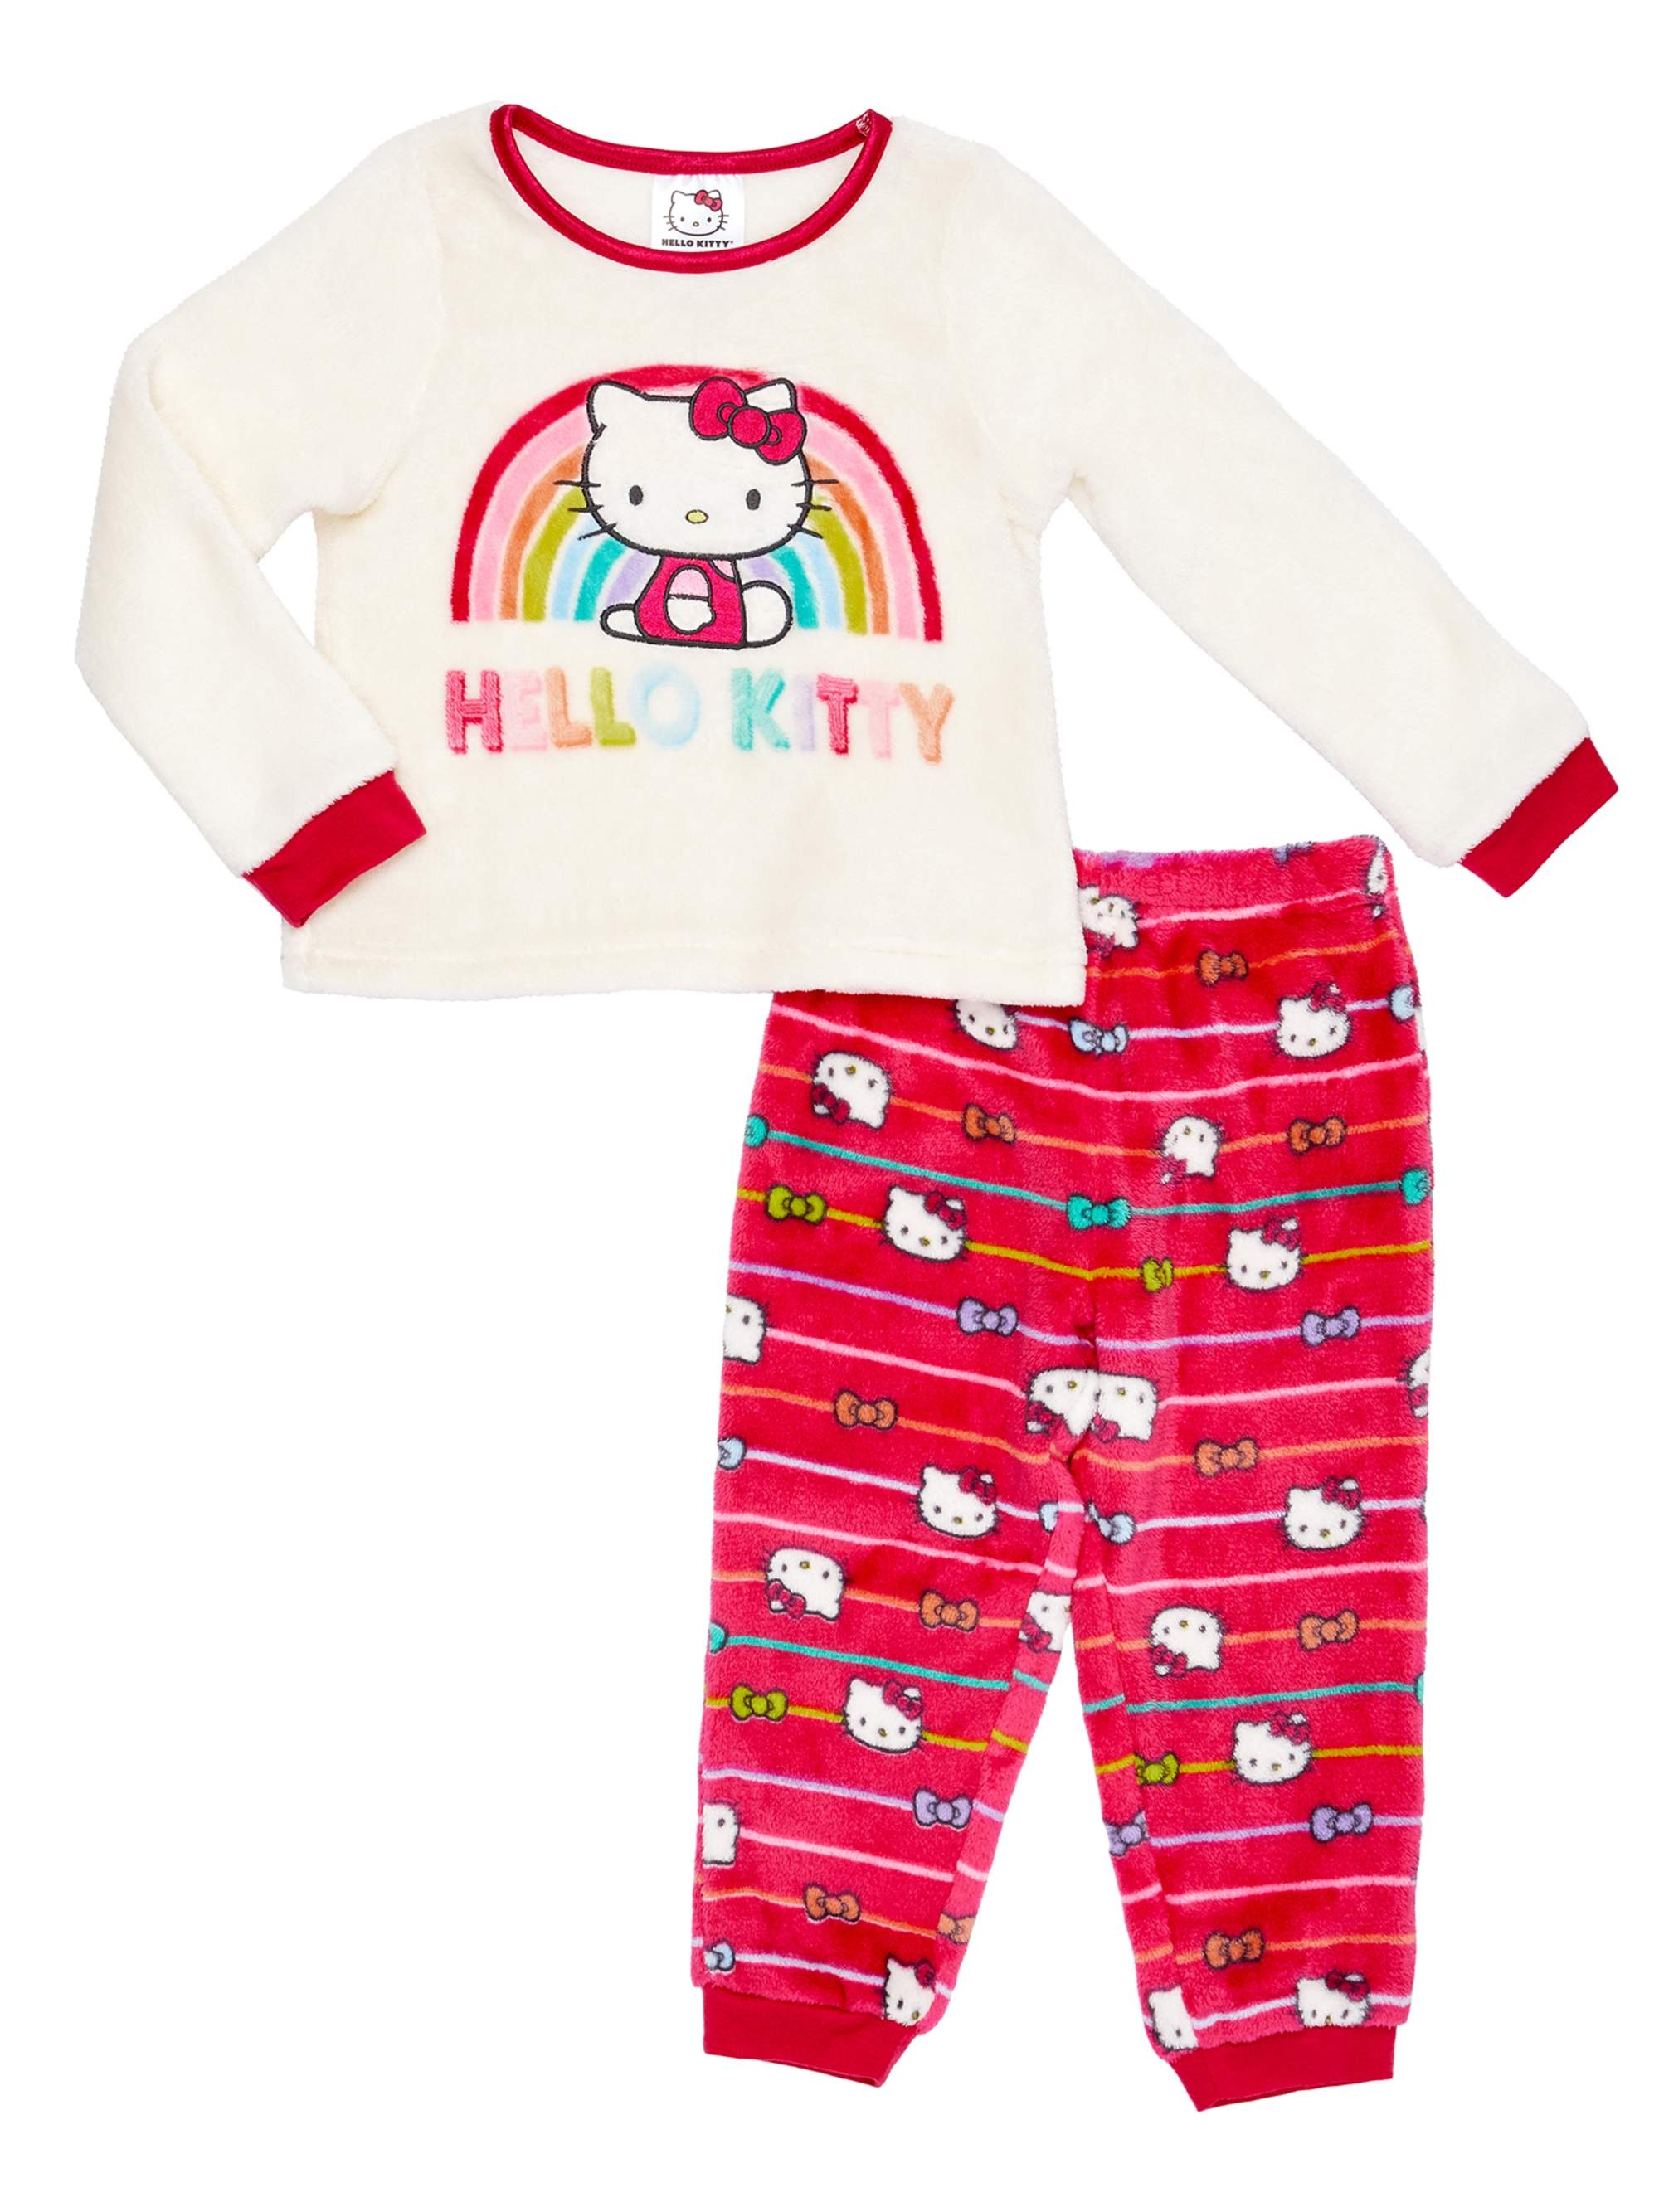 Hello Kitty Infant Girls Pink Purple Sleepwear Set Bow Print Pajamas 24m